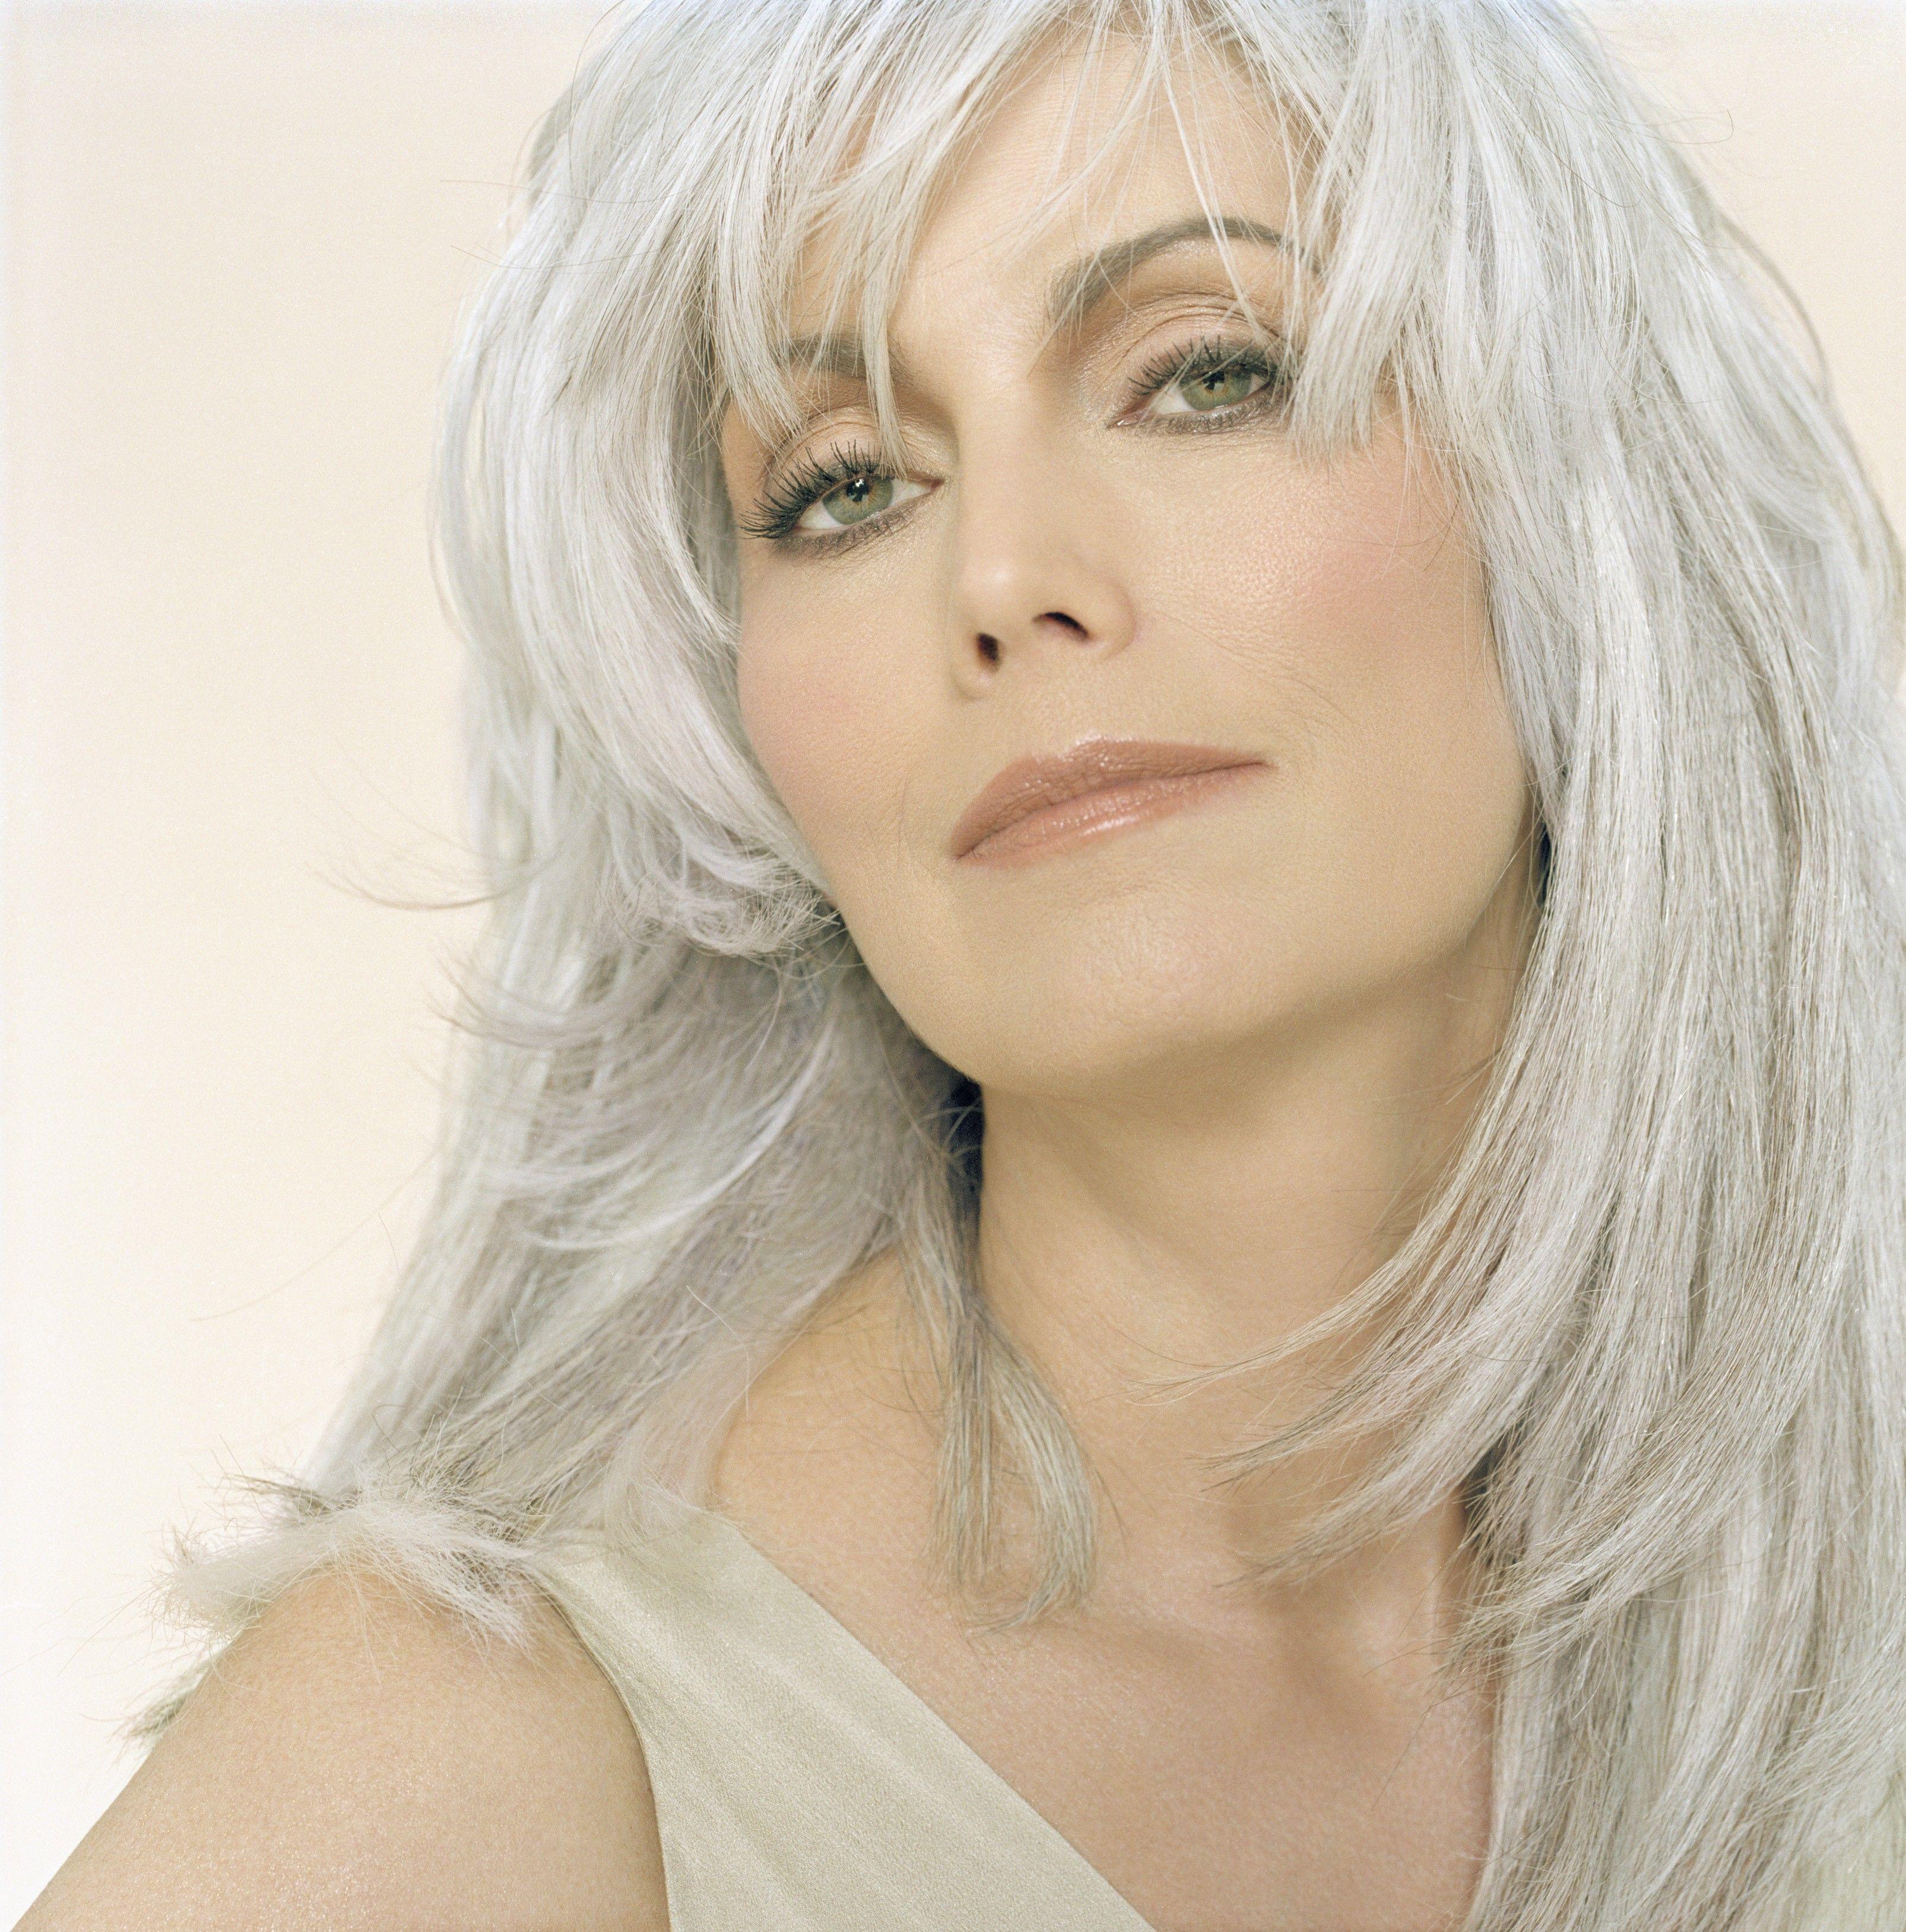 Gray Hair Is y on Women